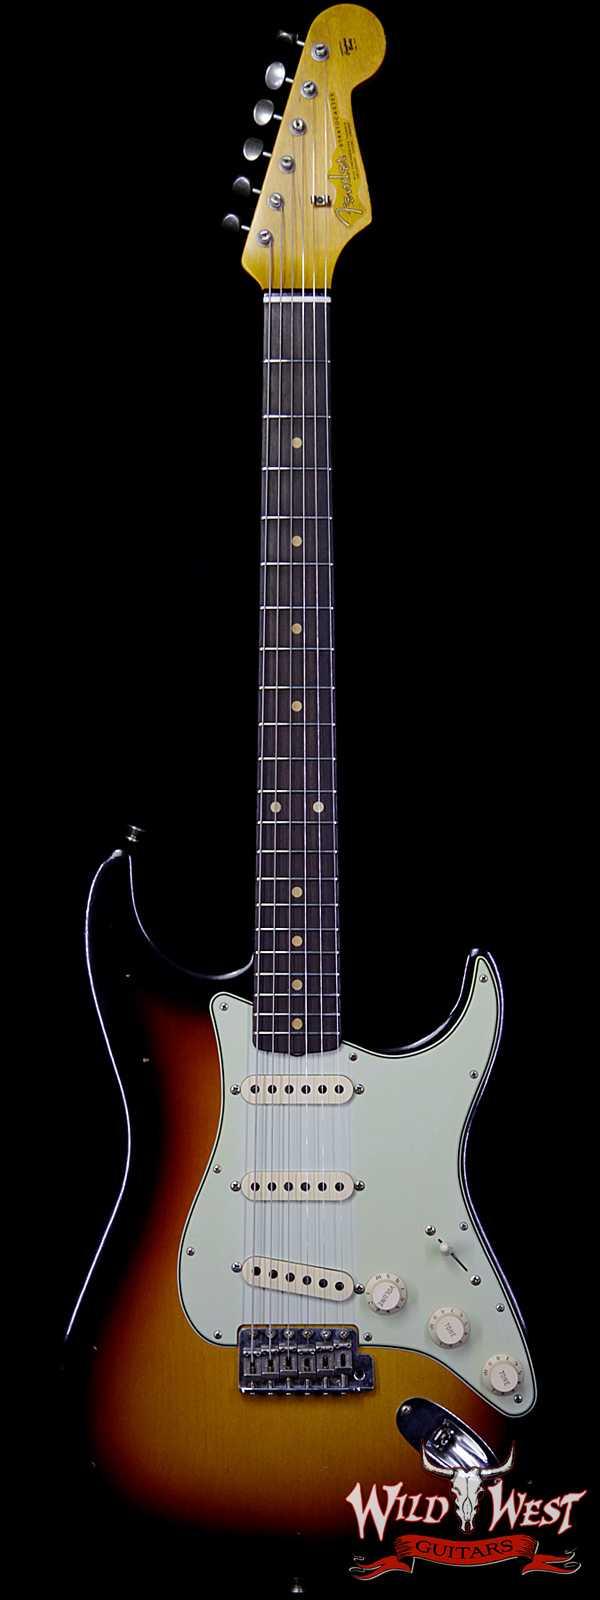 Fender Custom Shop 1963 Stratocaster Journeyman Relic with Dirty Neck 3 Tone Sunburst